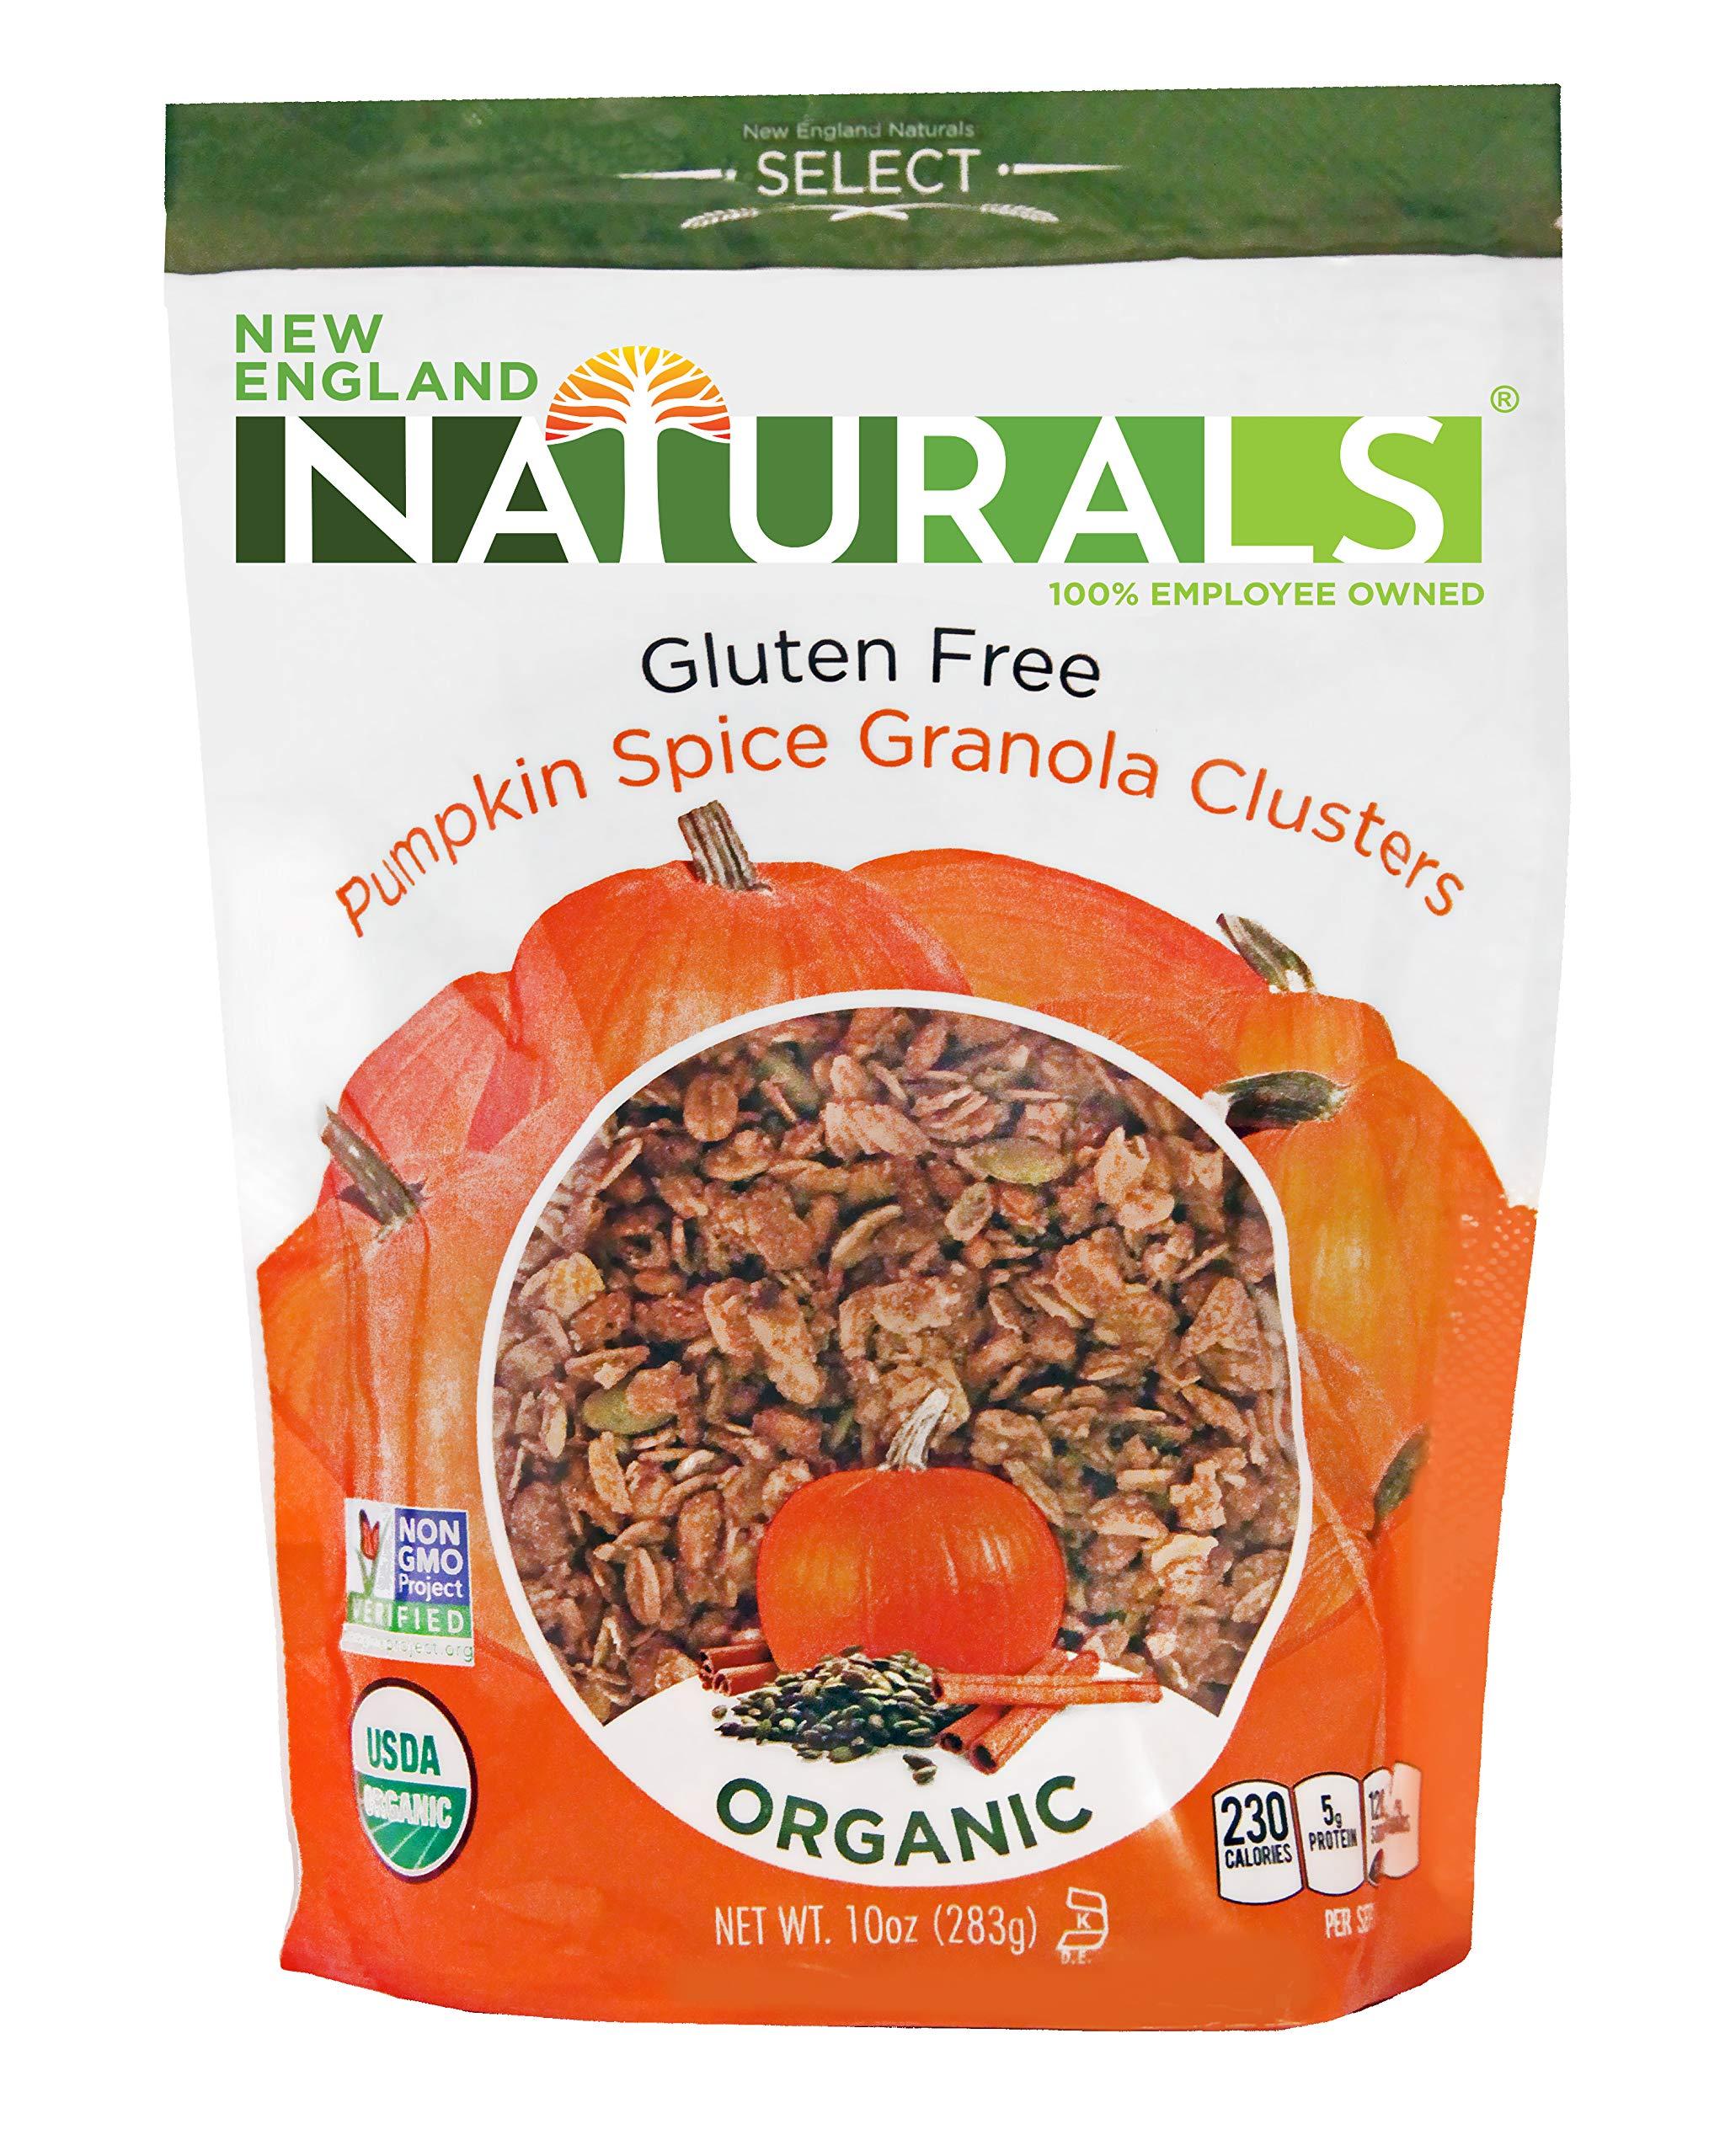 New England Naturals Organic Gluten-Free Pumpkin Spice Granola Clusters, 10 Ounce Pouch Gluten Free Pumpkin Spice Granola Cluster Breakfast Cereal, Non-GMO, USDA Organic, Kosher